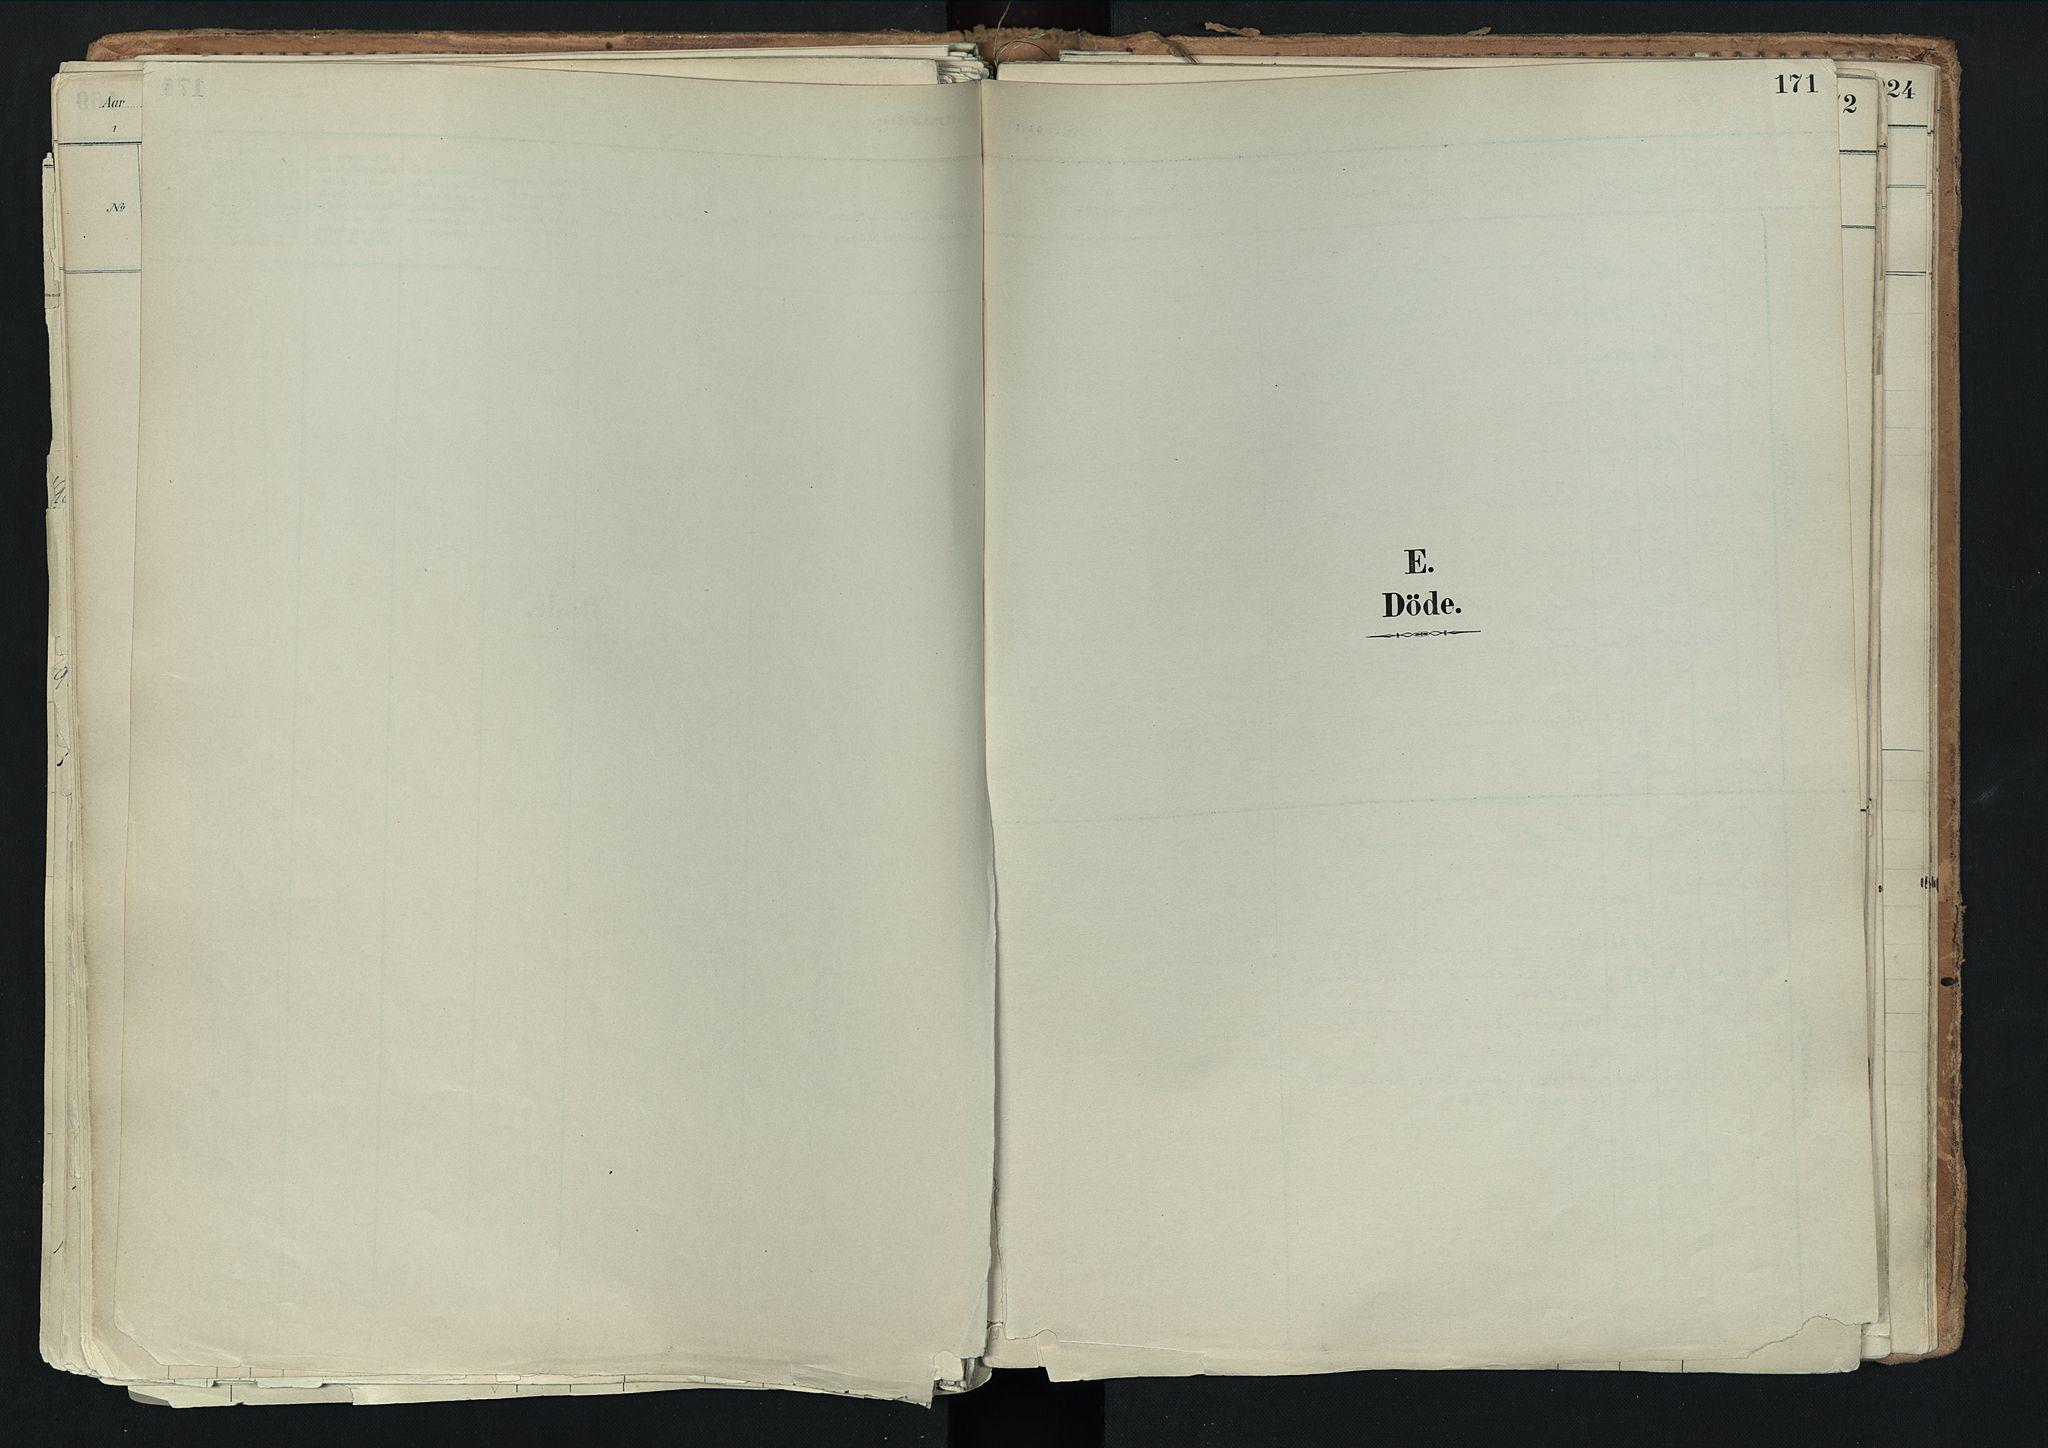 SAH, Nord-Fron prestekontor, Ministerialbok nr. 3, 1884-1914, s. 171